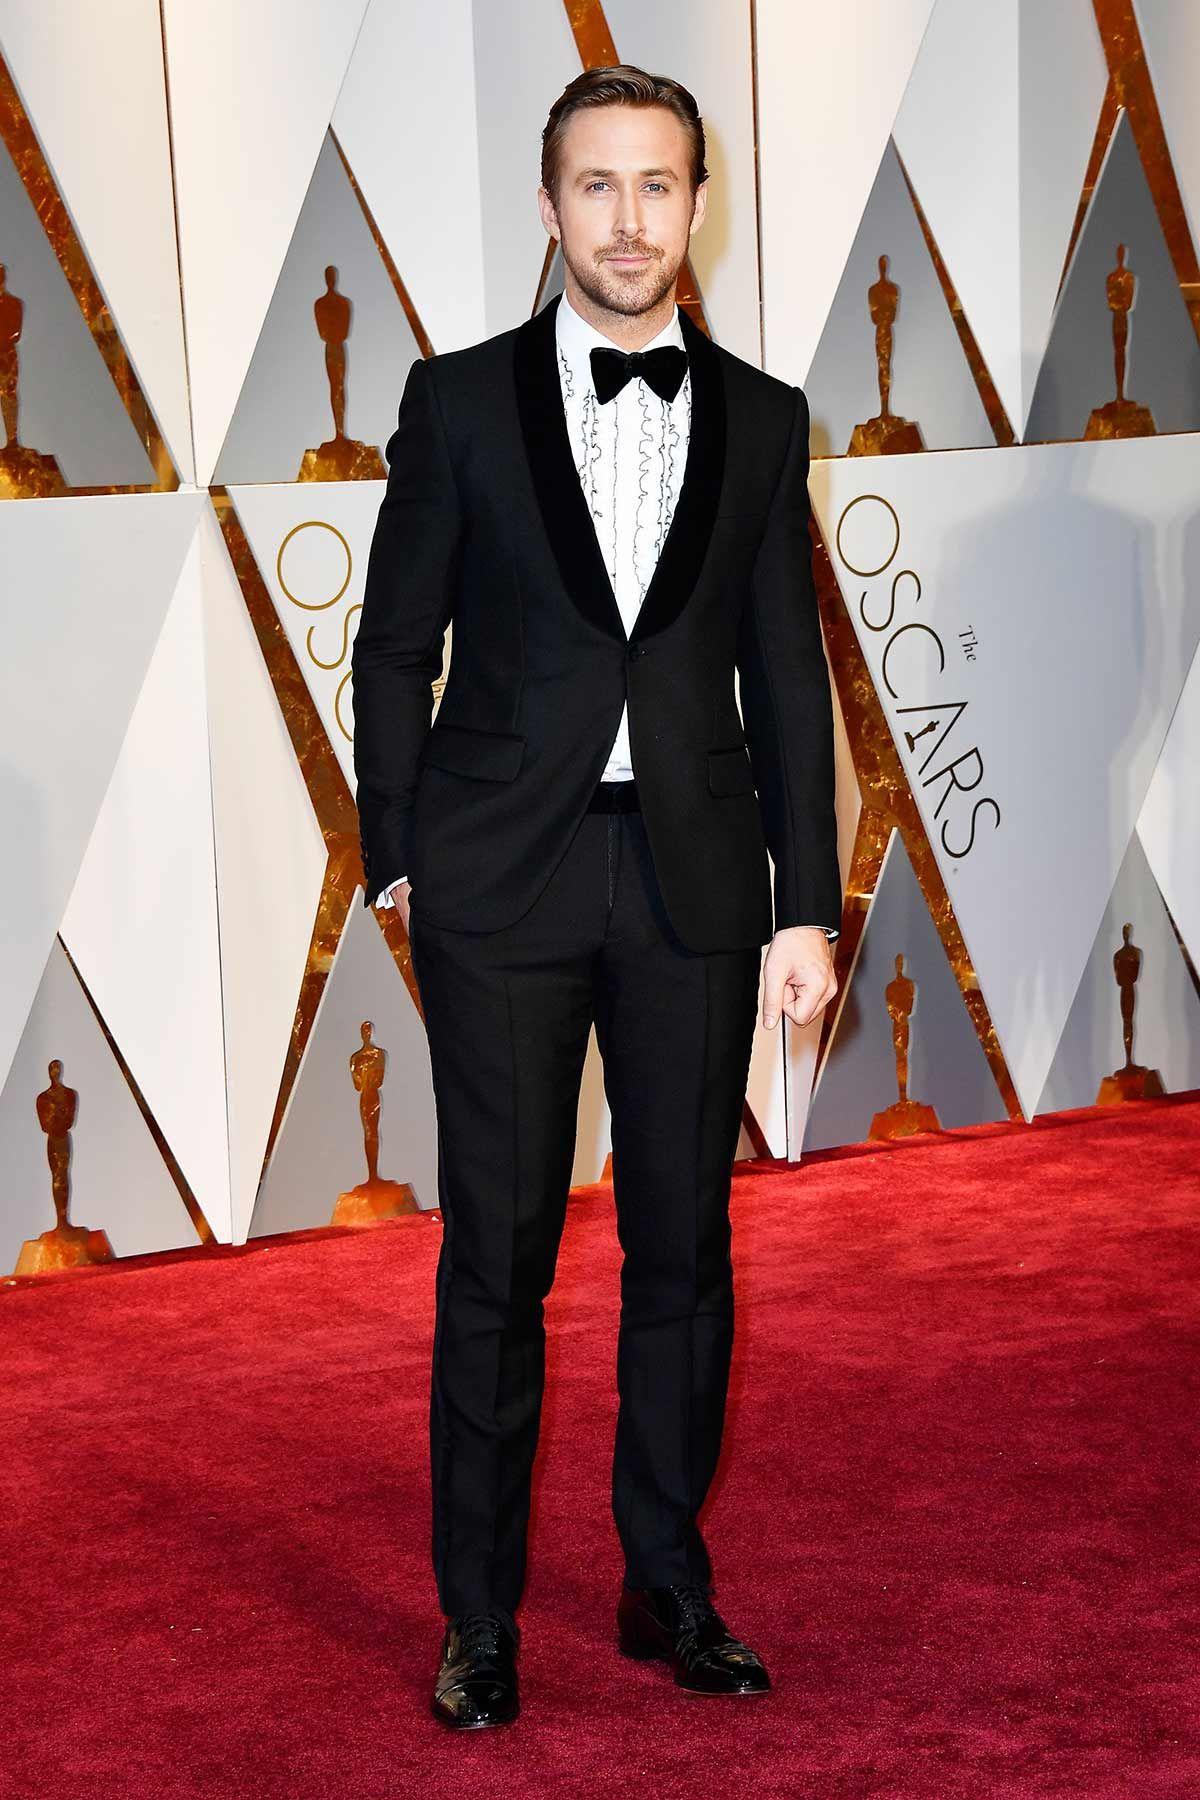 La Alfombra Roja De Los Premios Oscar 2017 Red Carpet Oscars Celebrity Dresses Red Carpet Best Dressed Man